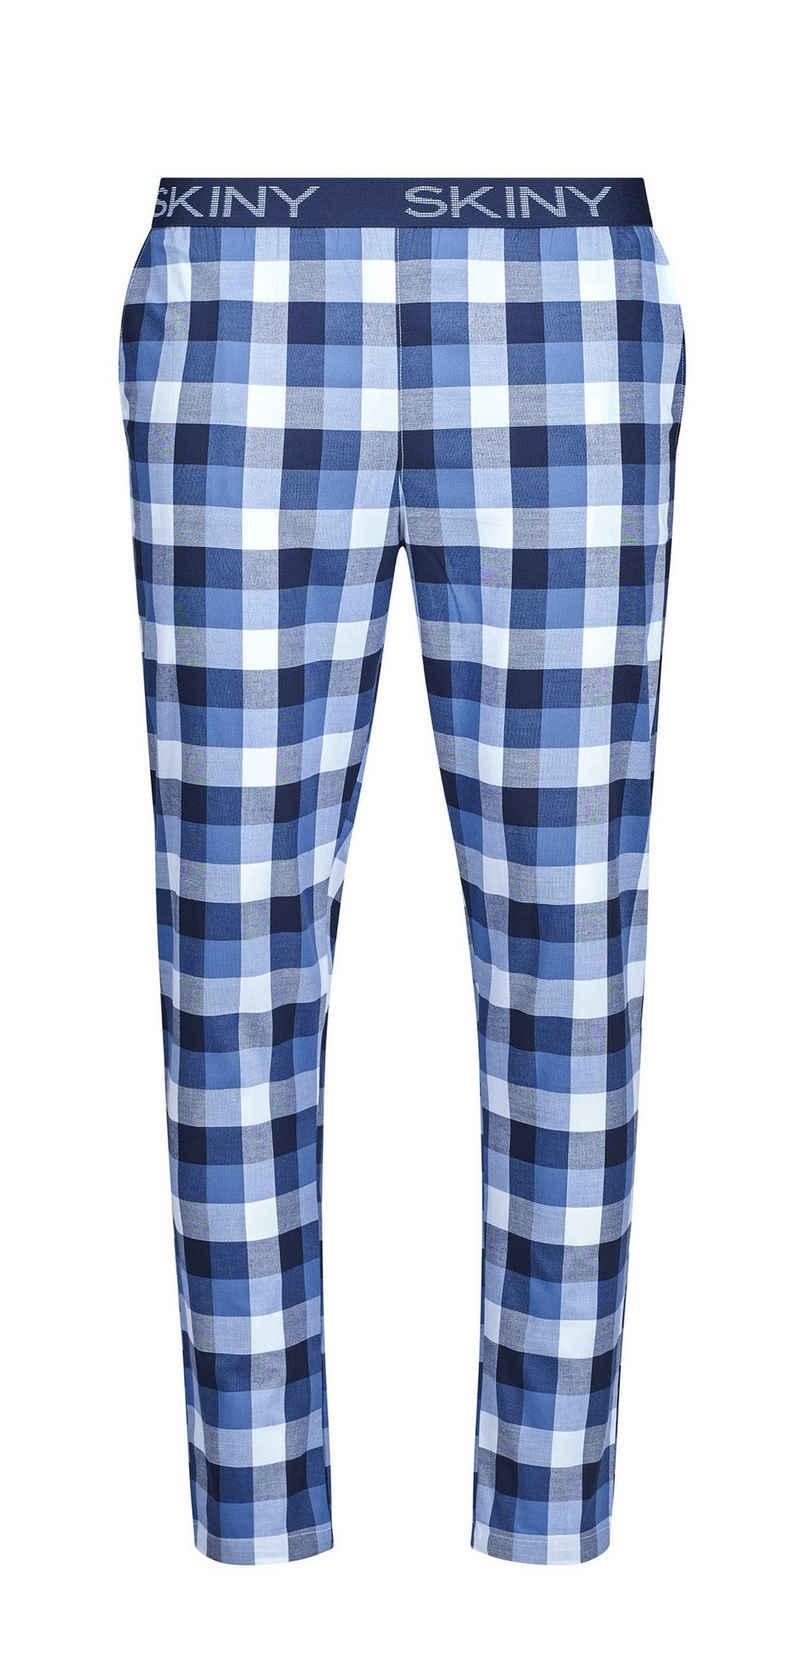 Skiny Pyjamahose »Skiny Herren Pyjama Hose kariert« (1-tlg) Modisches Design Baumwolle